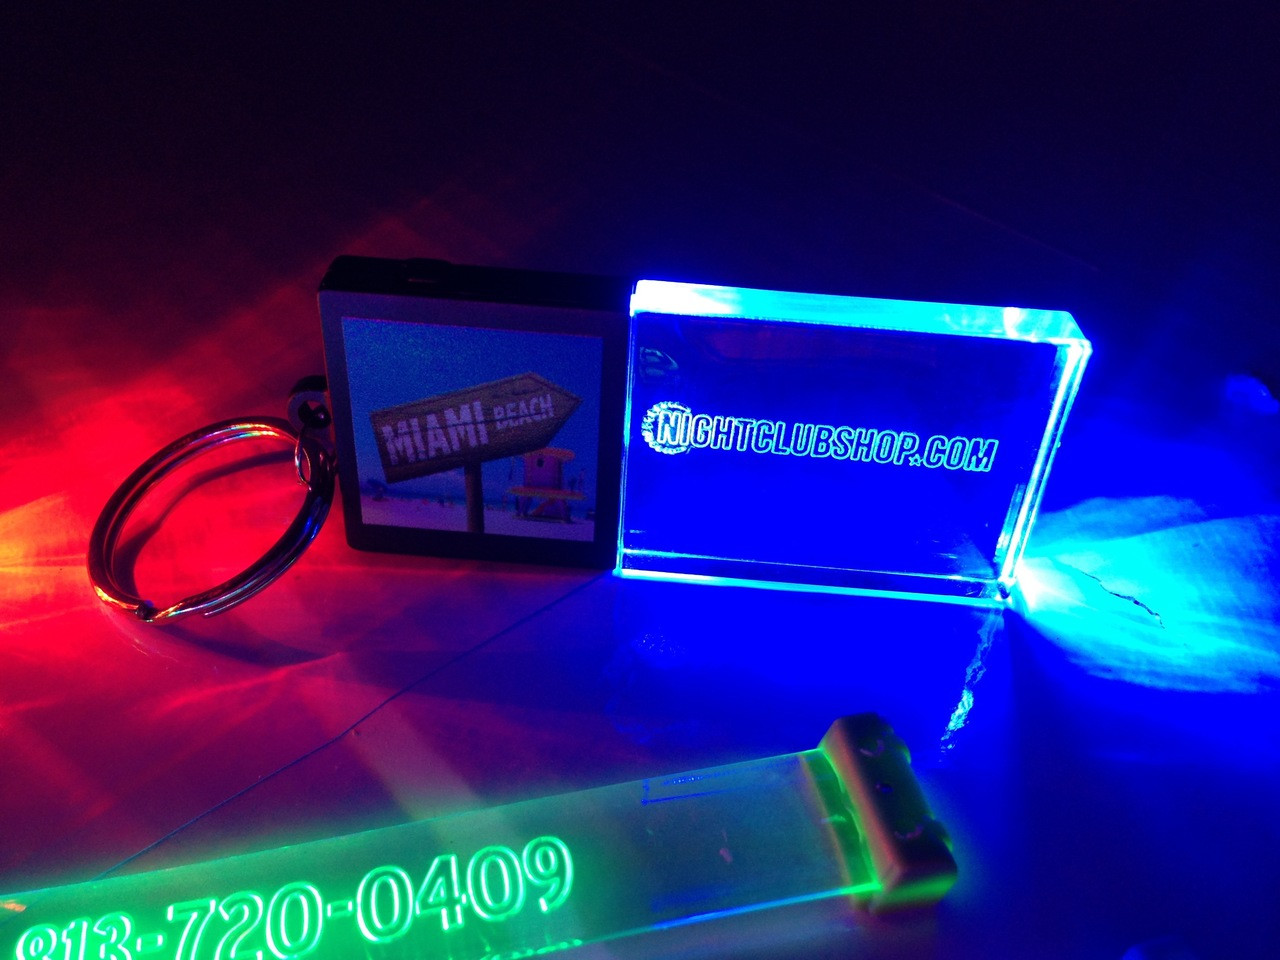 LED,Keychain,Key,chain,LED keychain, custom, BEAM, dual, print,engraved, logo,text, laser engraved,two logo, personalized,promo,merch,fundraiser,nightclub,fund raiser,light up